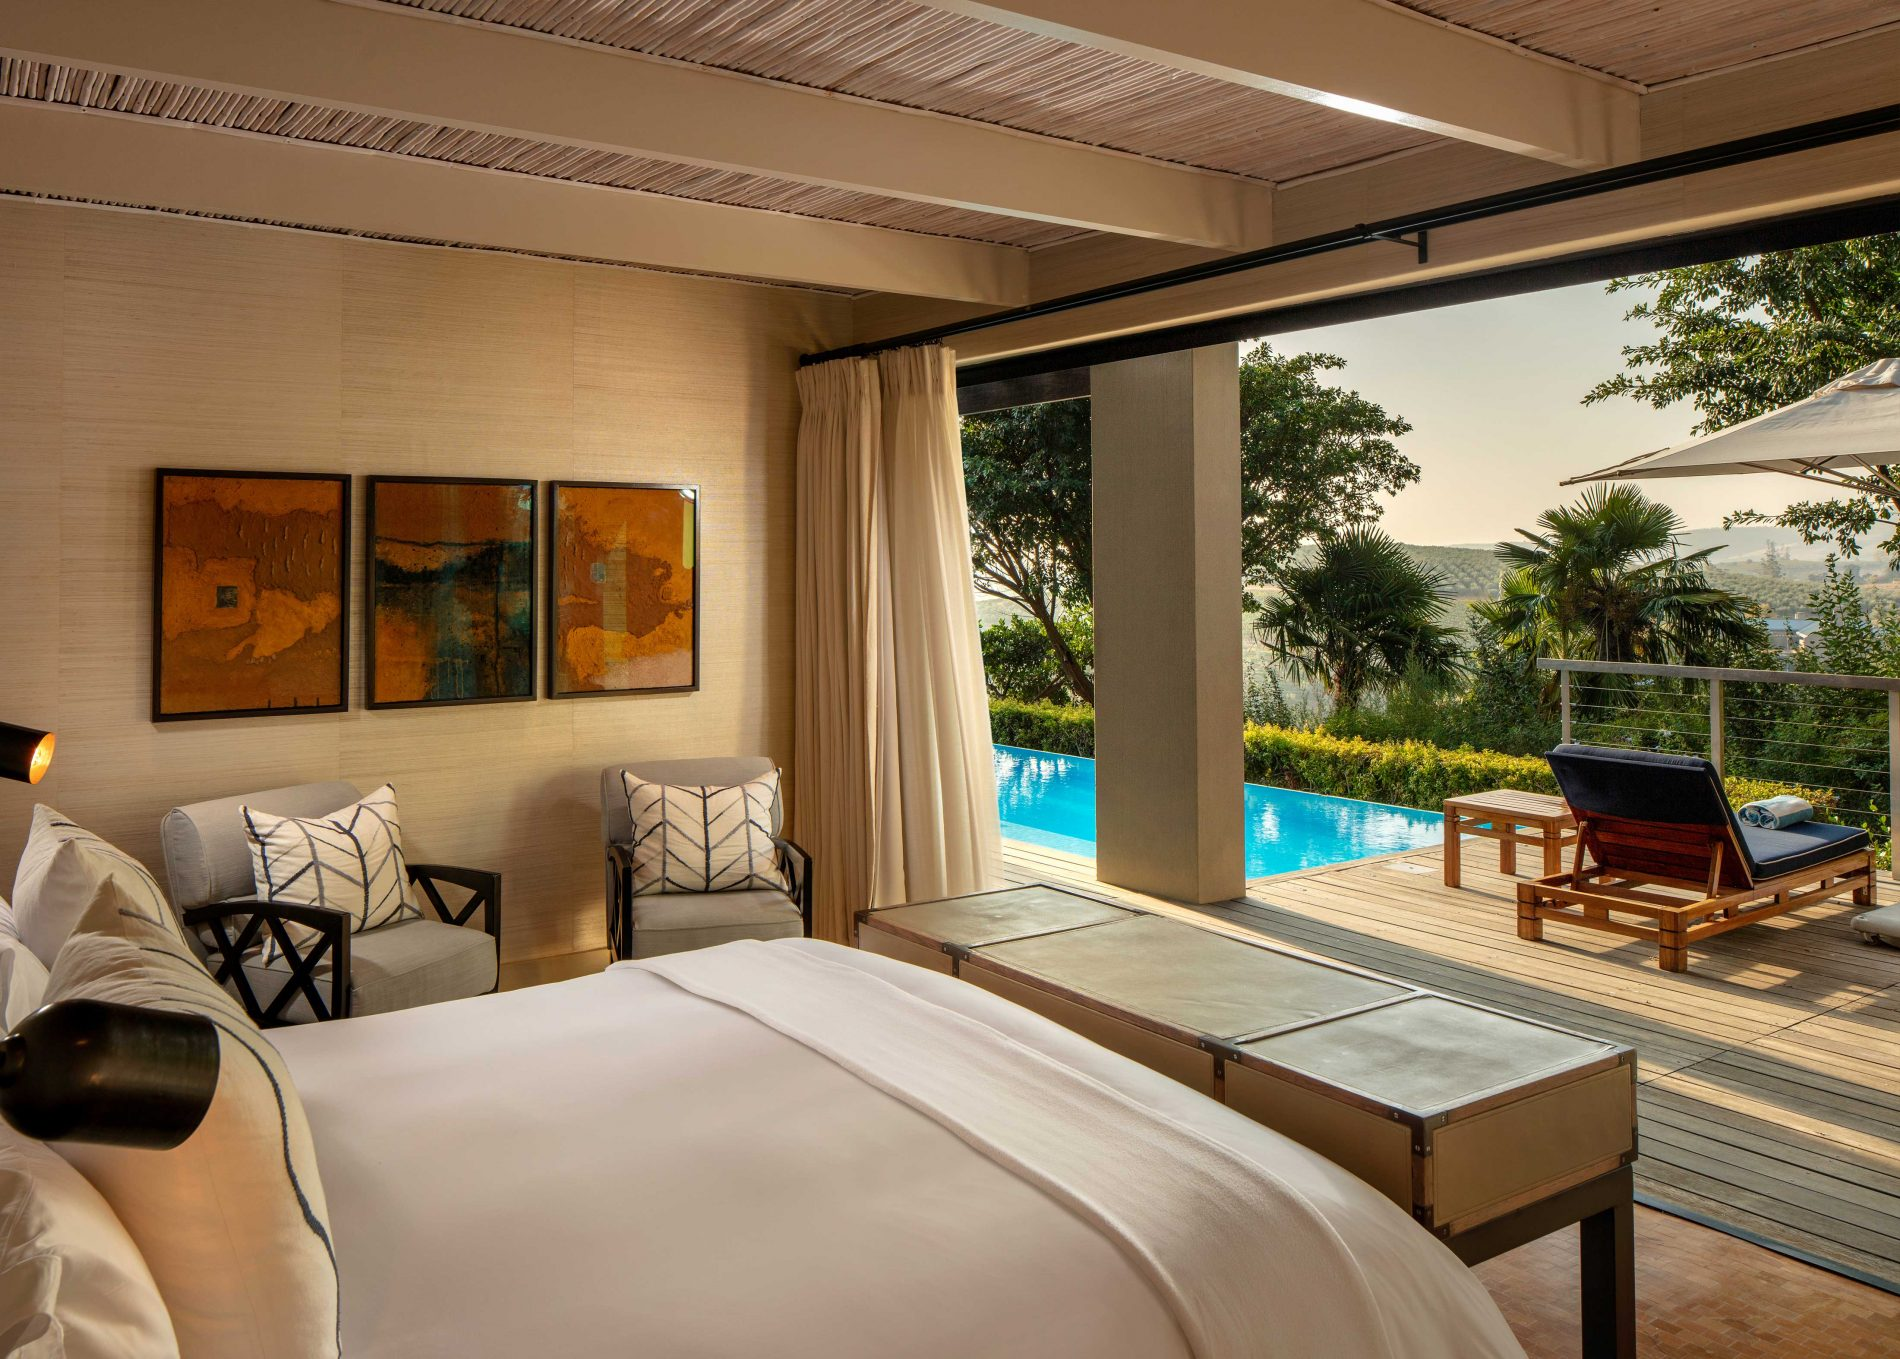 Presidential Lodge 2 Bedroom